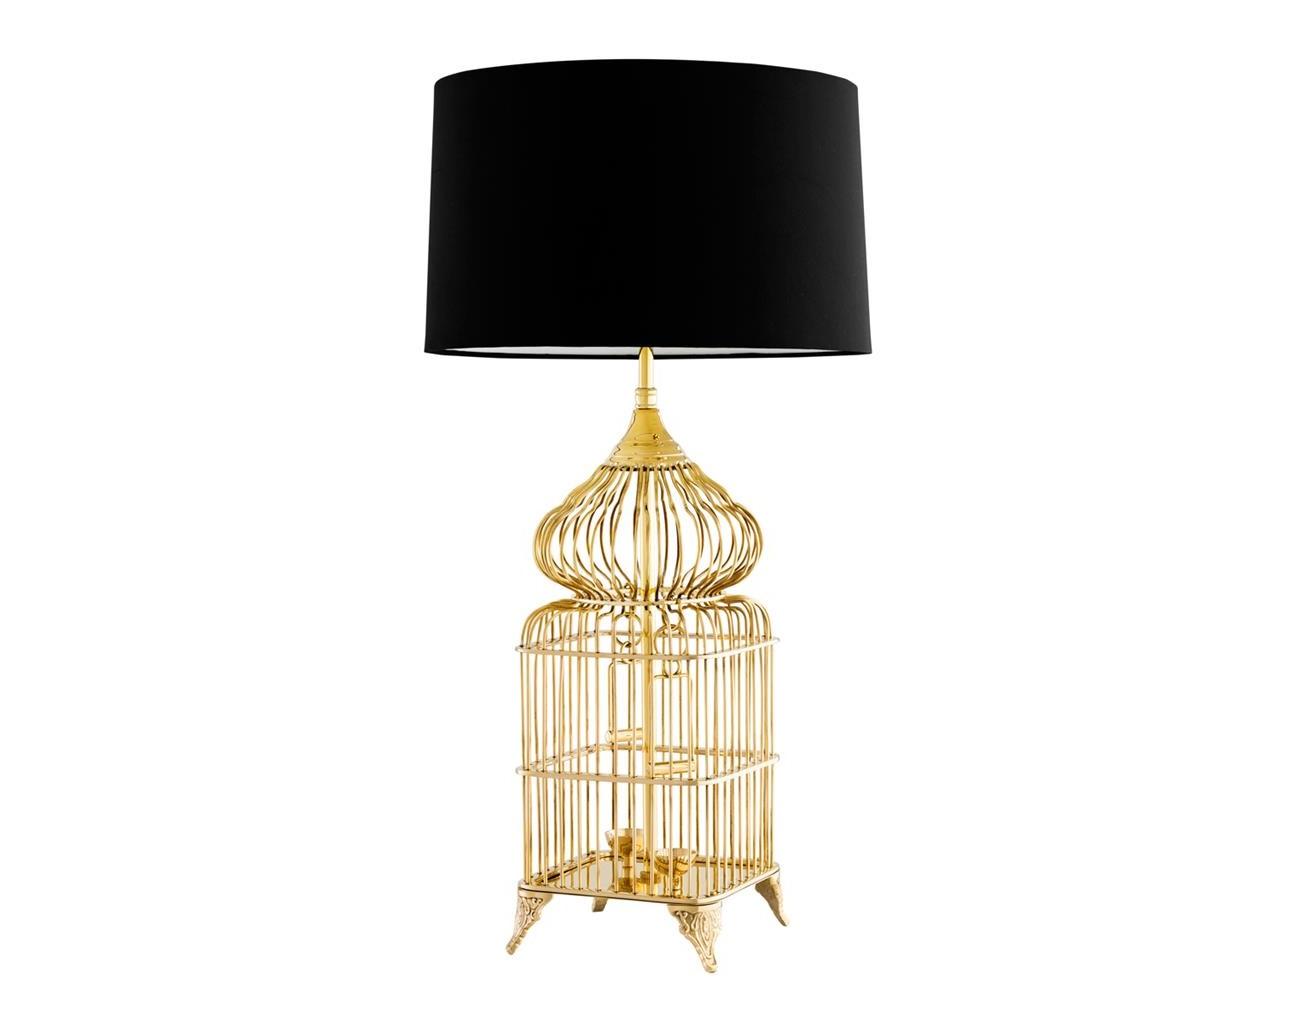 Настольная лампа Table Lamp La CageДекоративные лампы<br>&amp;lt;div&amp;gt;Вид цоколя: E27&amp;lt;br&amp;gt;&amp;lt;/div&amp;gt;&amp;lt;div&amp;gt;&amp;lt;div&amp;gt;Мощность: 40W&amp;lt;/div&amp;gt;&amp;lt;div&amp;gt;Количество ламп: 2 (нет в комплекте)&amp;lt;/div&amp;gt;&amp;lt;/div&amp;gt;<br><br>Material: Металл<br>Ширина см: 39.0<br>Высота см: 71.0<br>Глубина см: 39.0